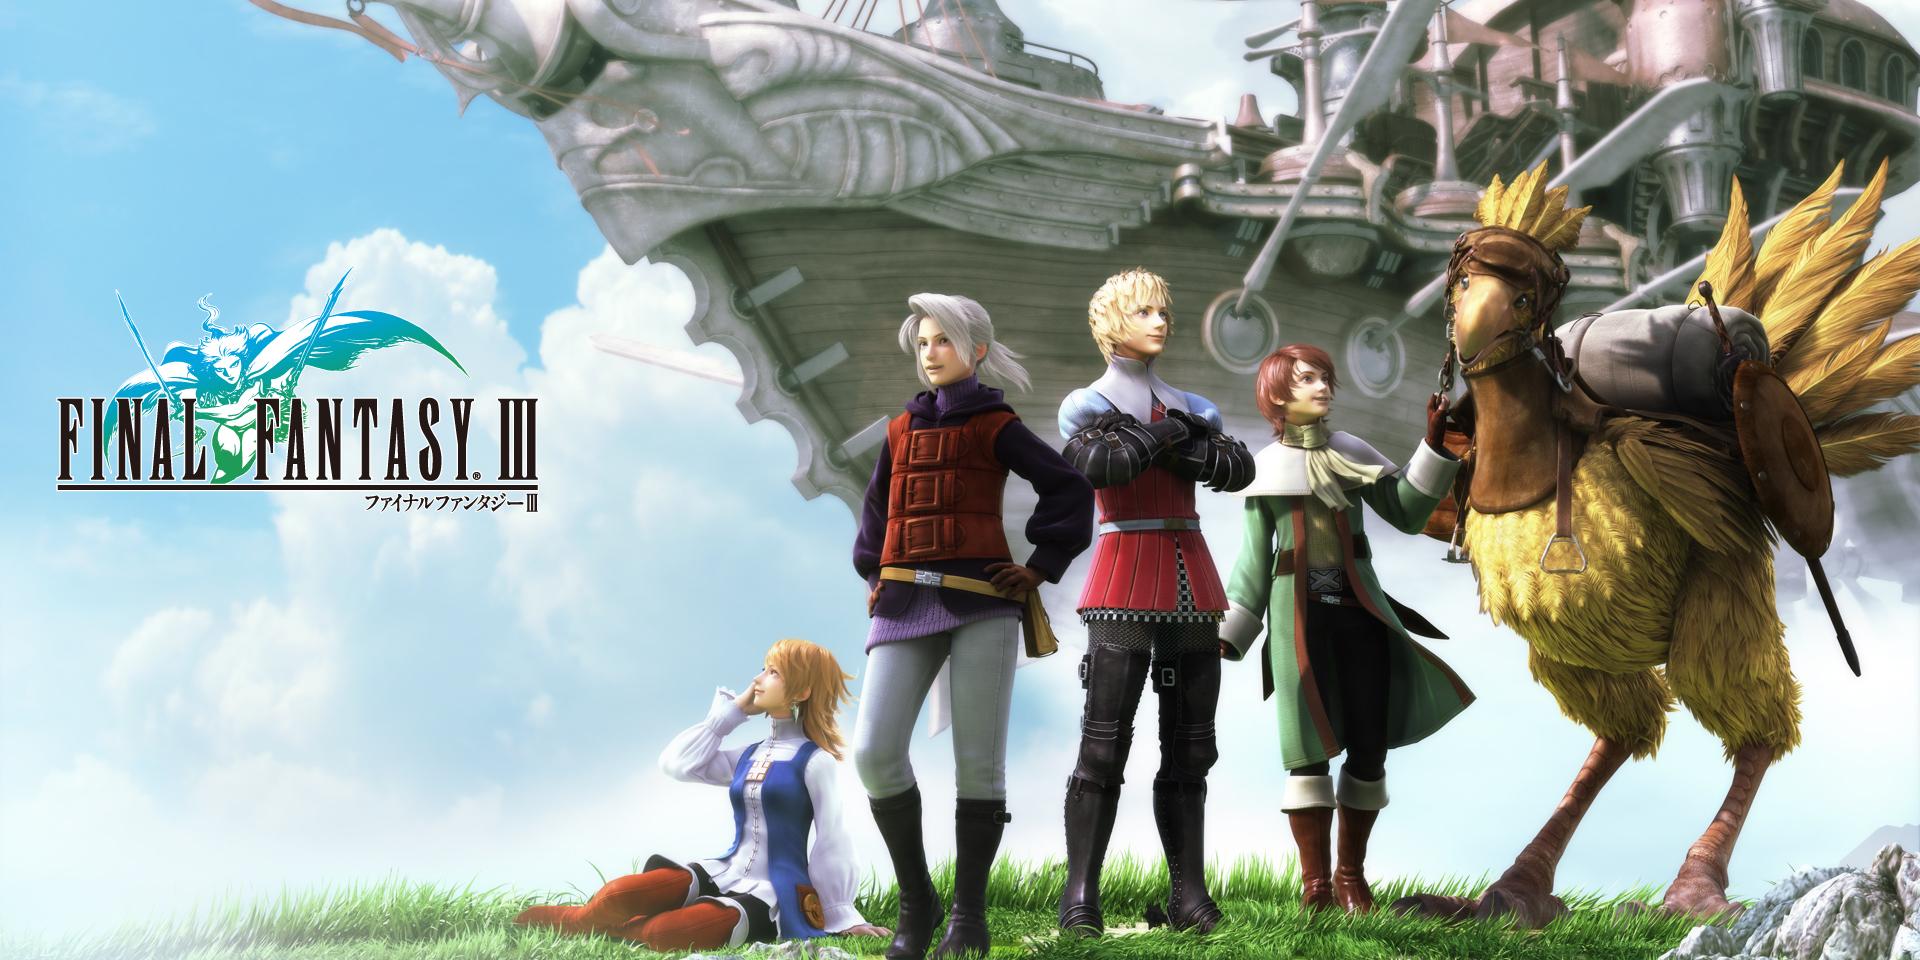 final-fantasy-iii-ios-sale-01